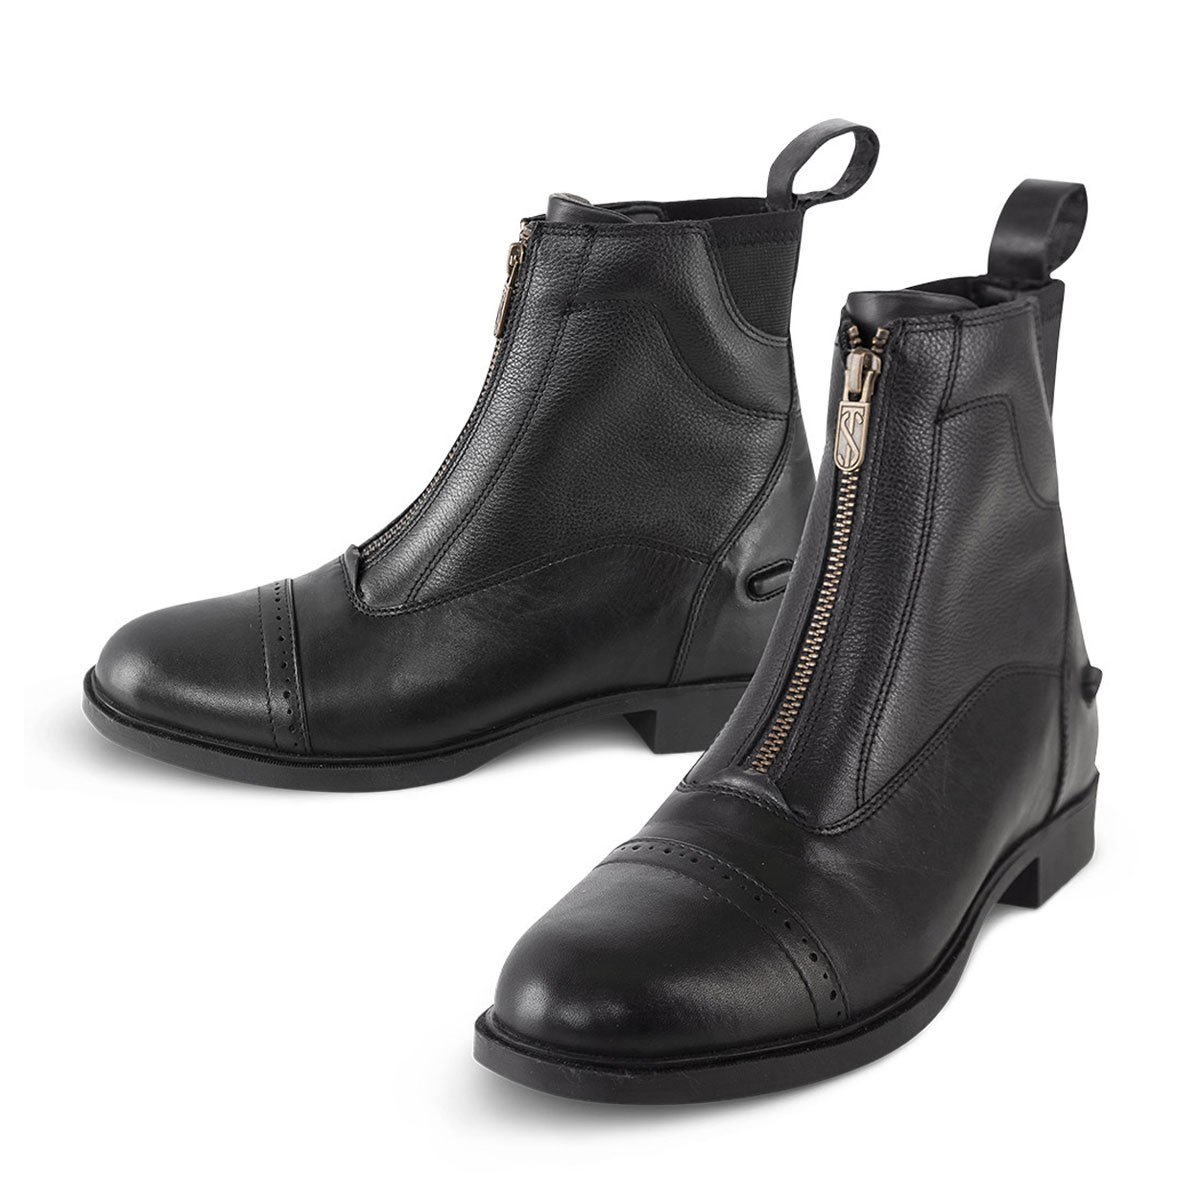 Tredstep Giotto II Zip Paddock Boot